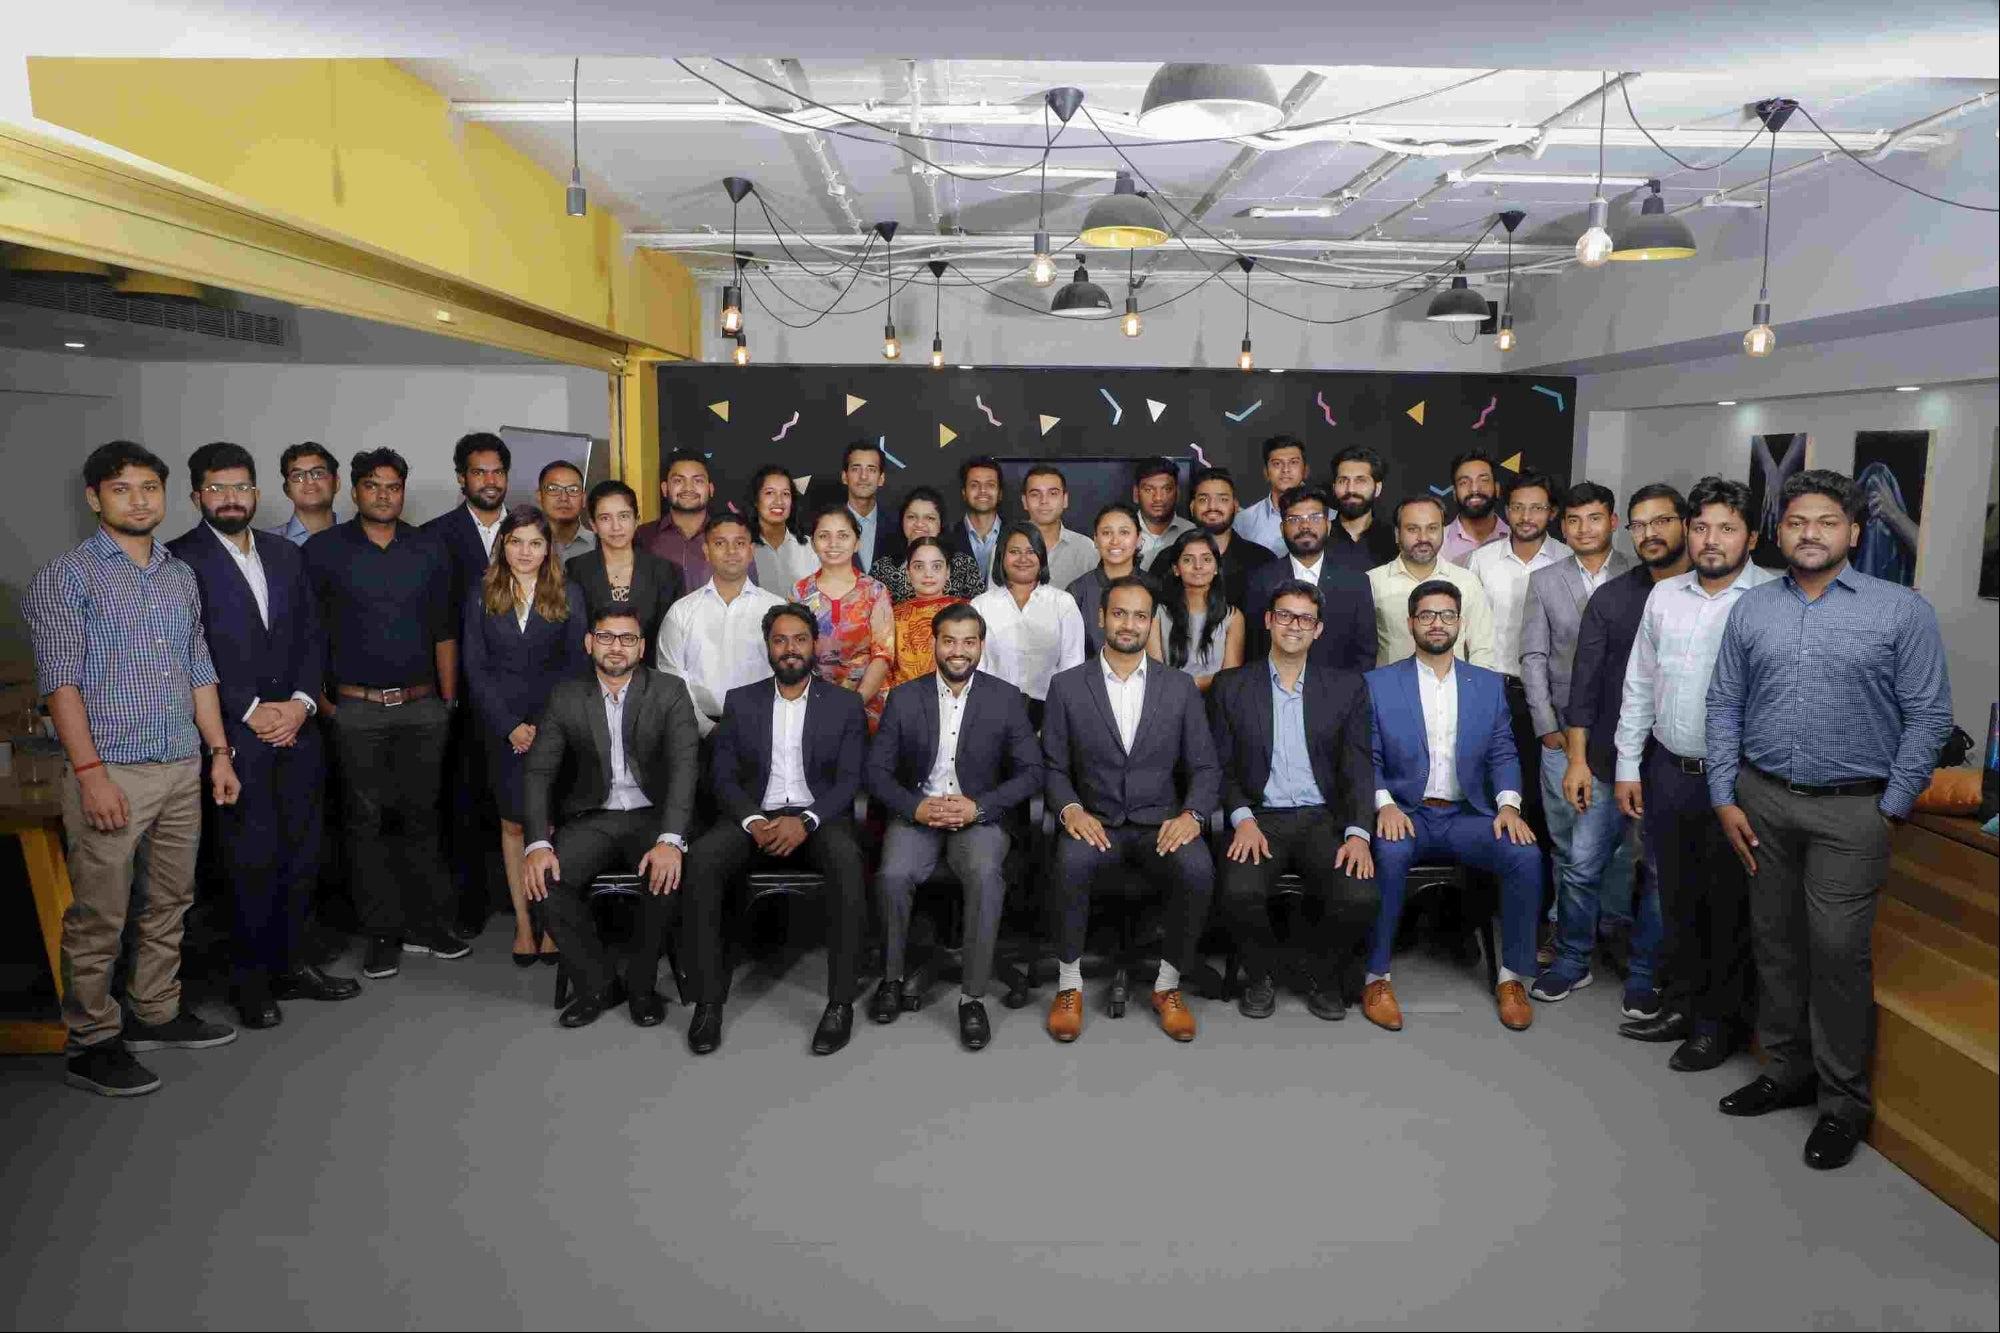 CoinDCX Becomes India's First Crypto Unicorn, Raises $90 Million